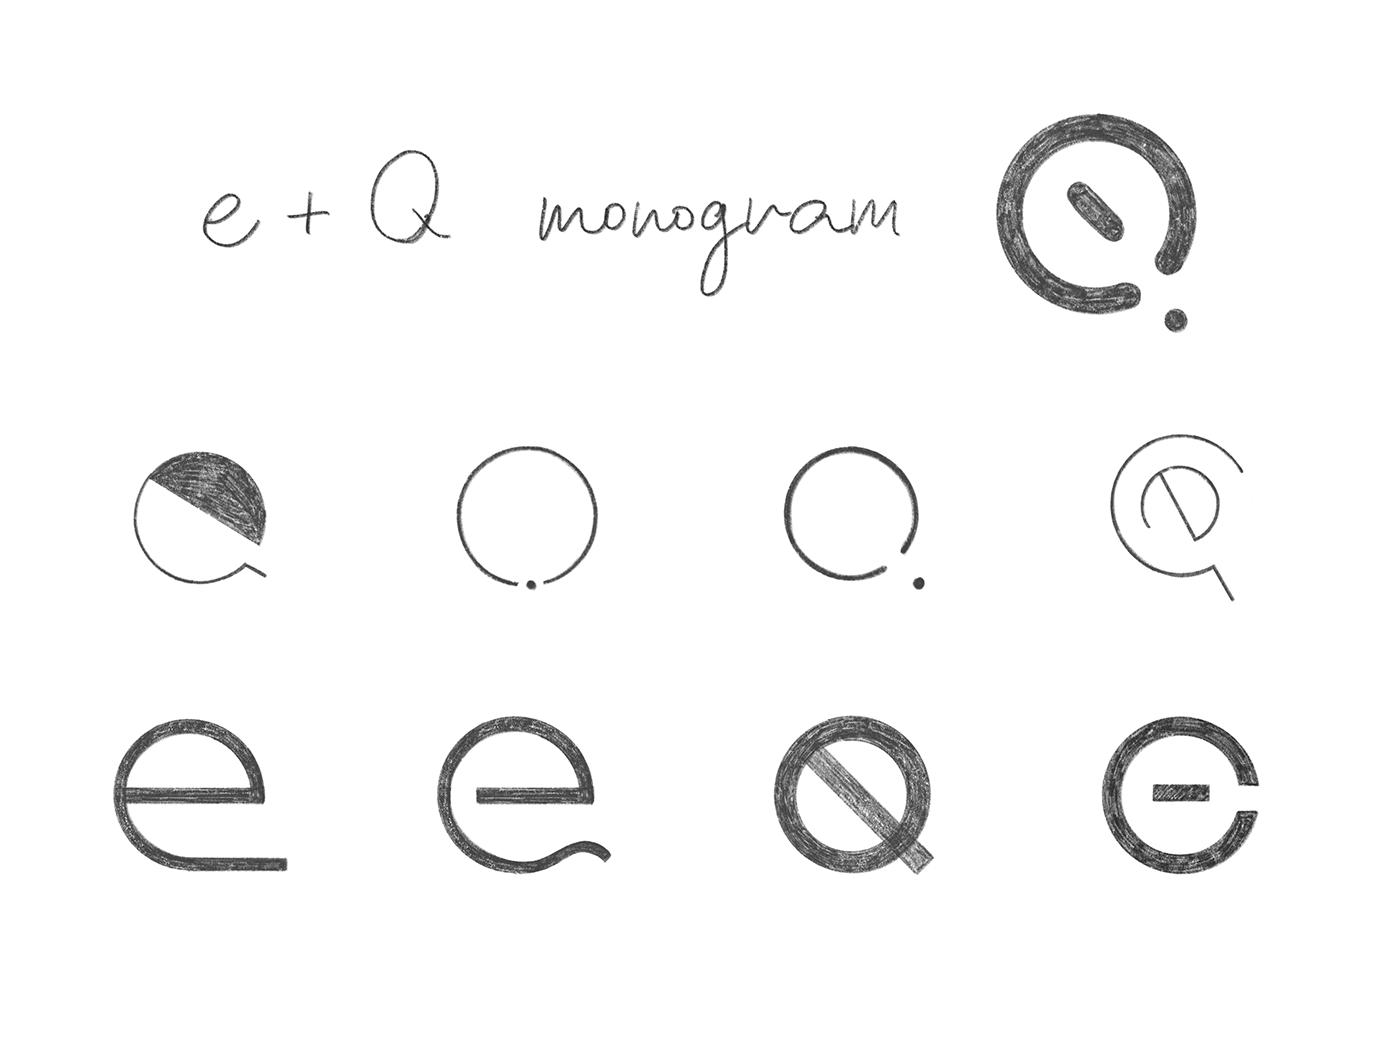 lettering branding  icon design  monogram design brand identity